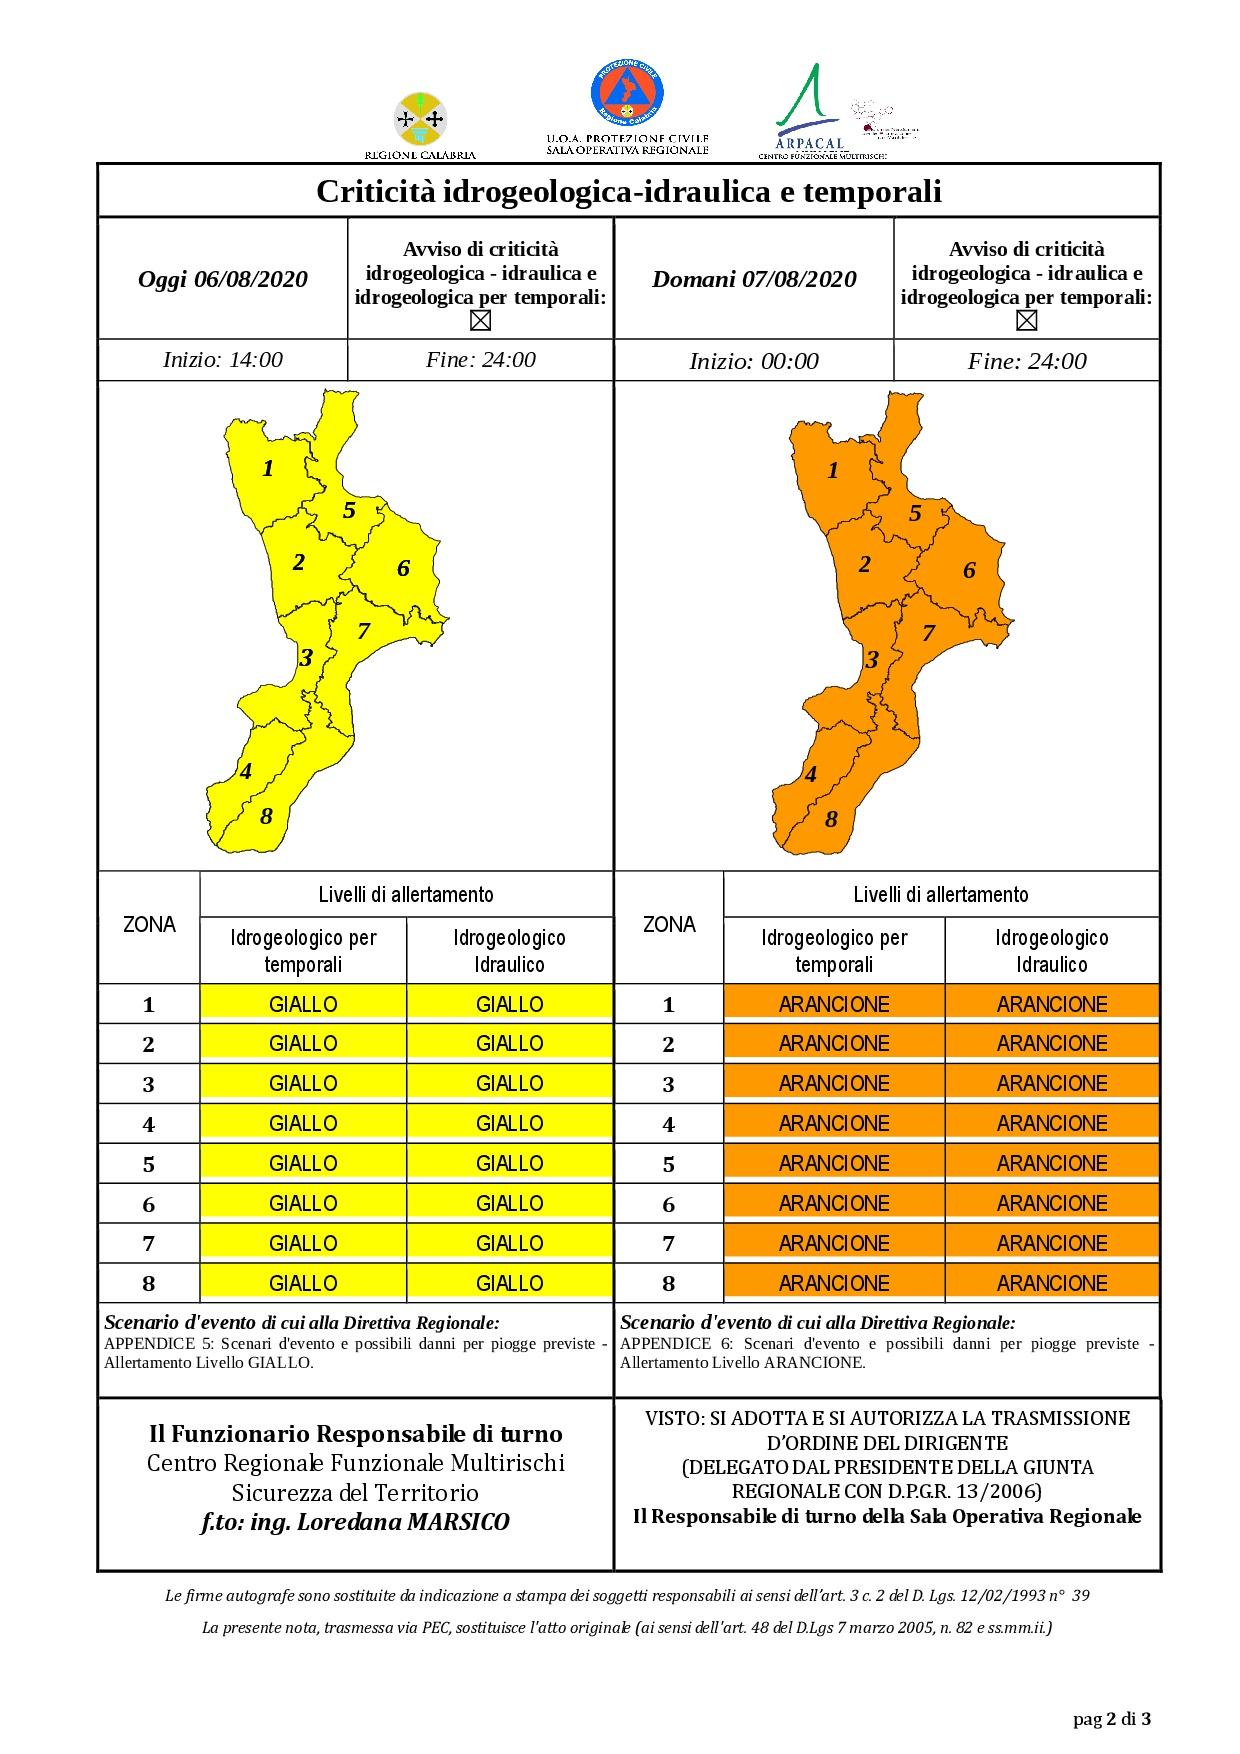 Criticità idrogeologica-idraulica e temporali in Calabria 06-08-2020